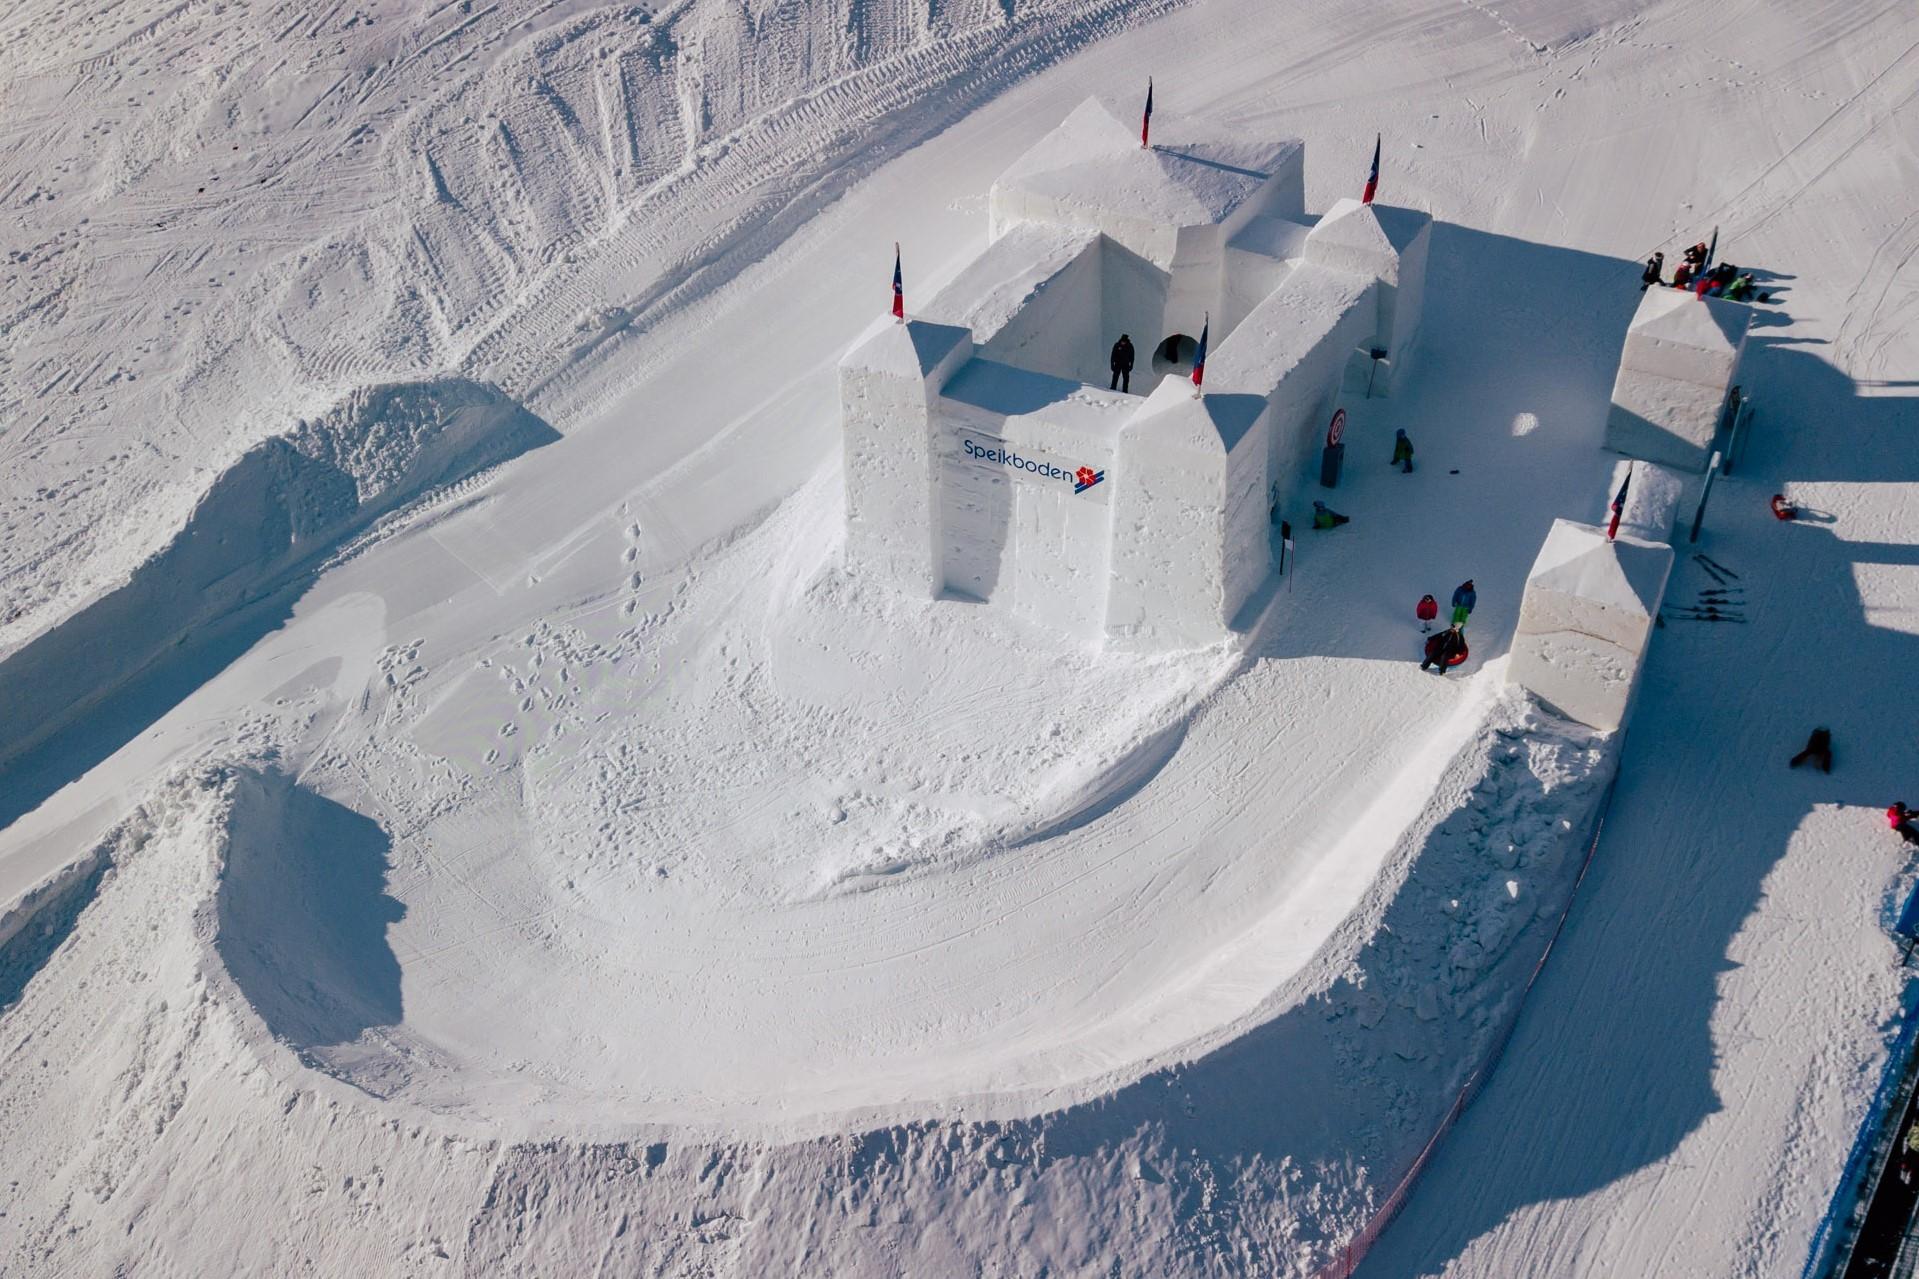 SNOWCASTLES - HISTORY